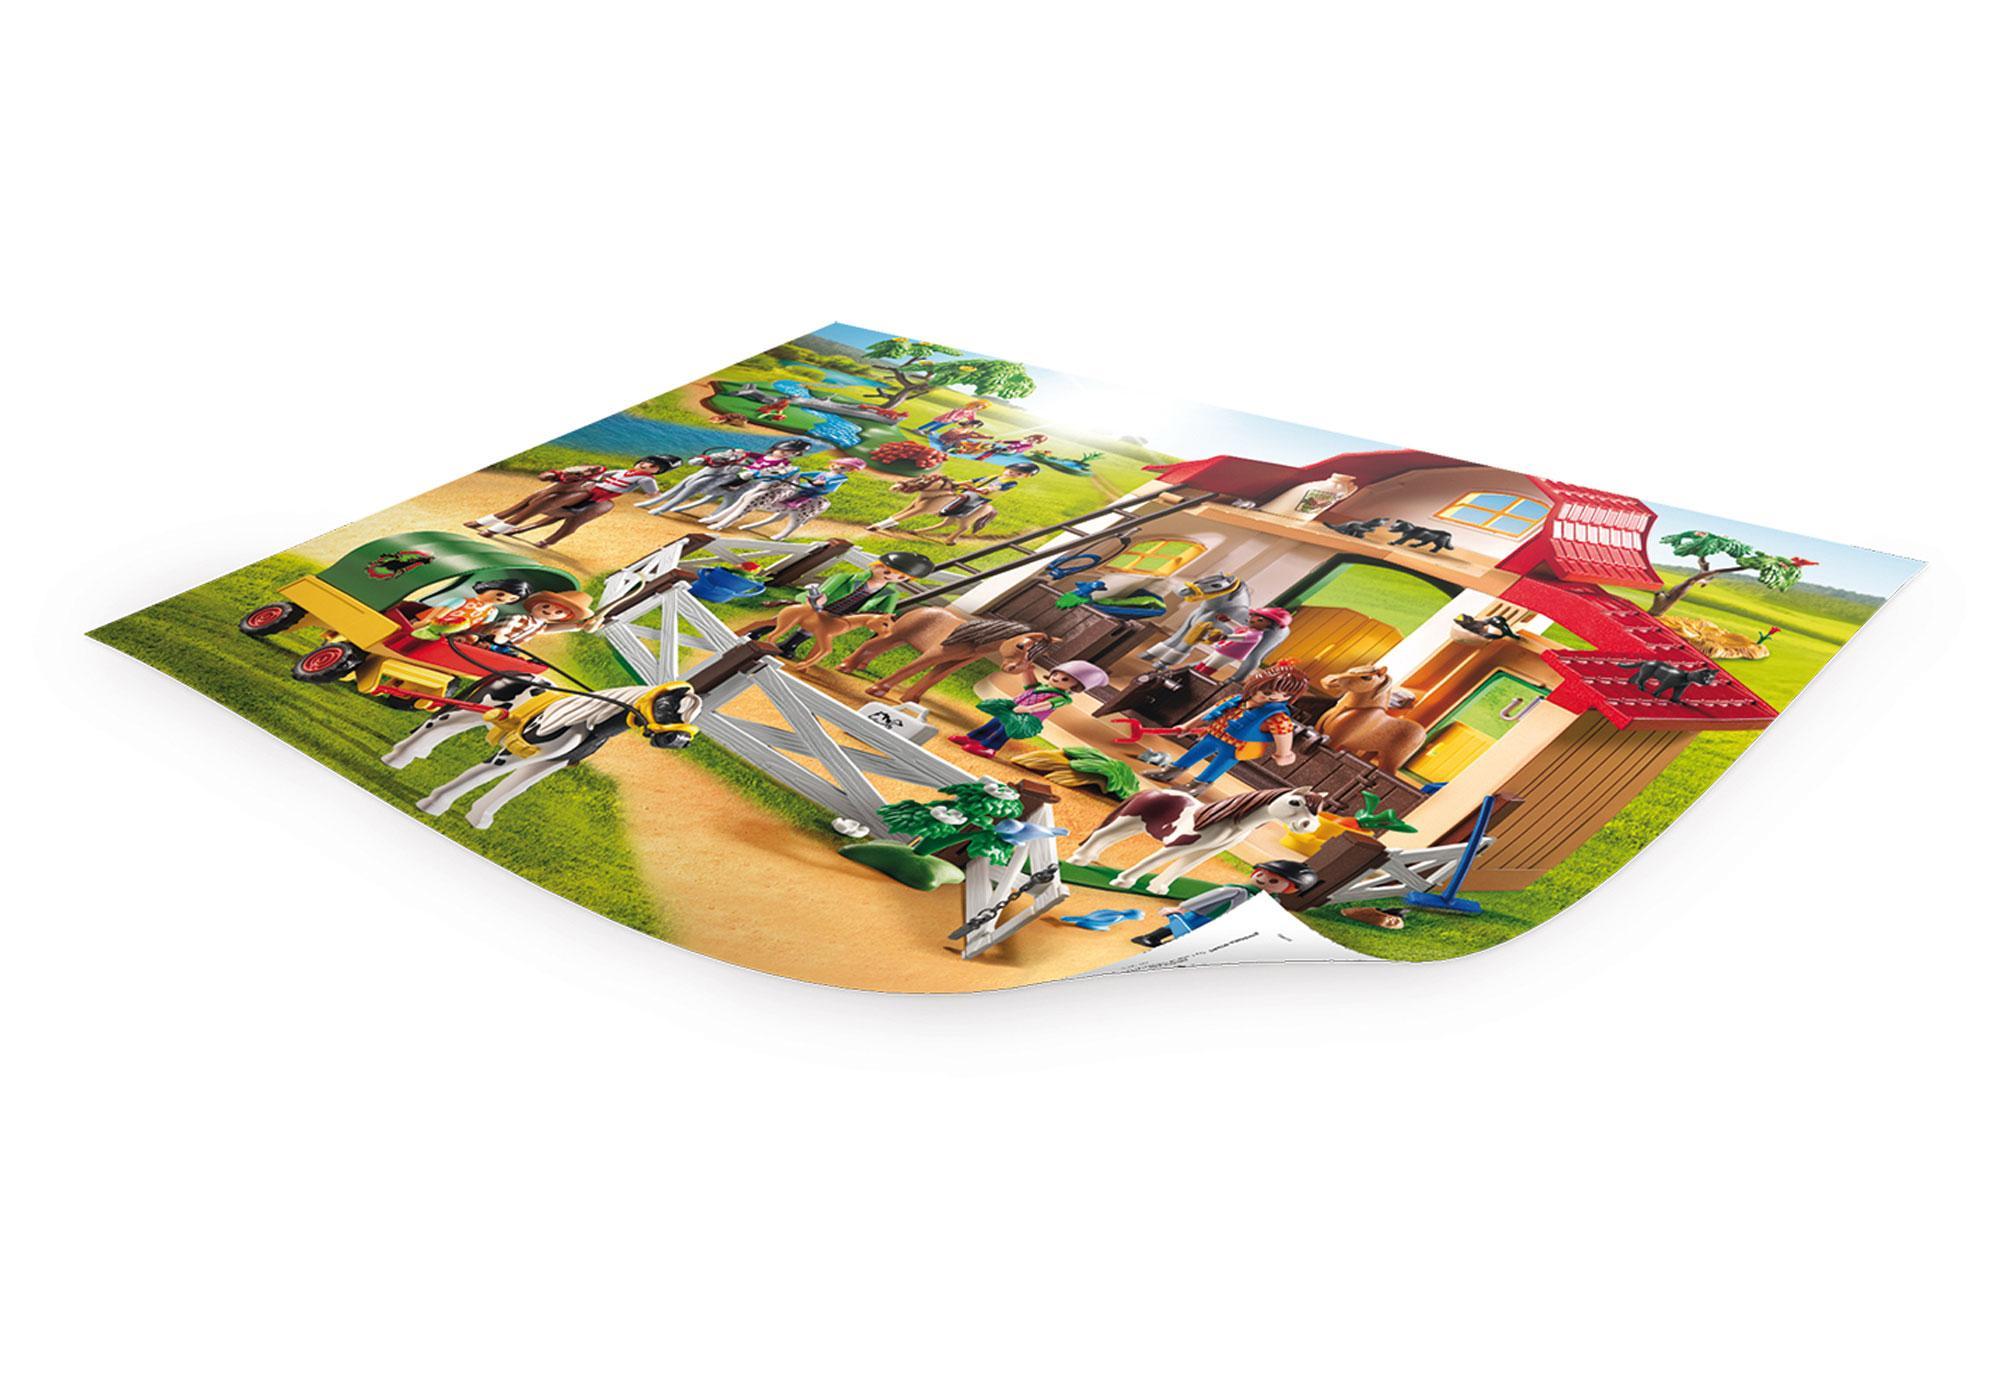 http://media.playmobil.com/i/playmobil/80096_product_extra1/SpielKarten! - Die Kartenspielesammlung